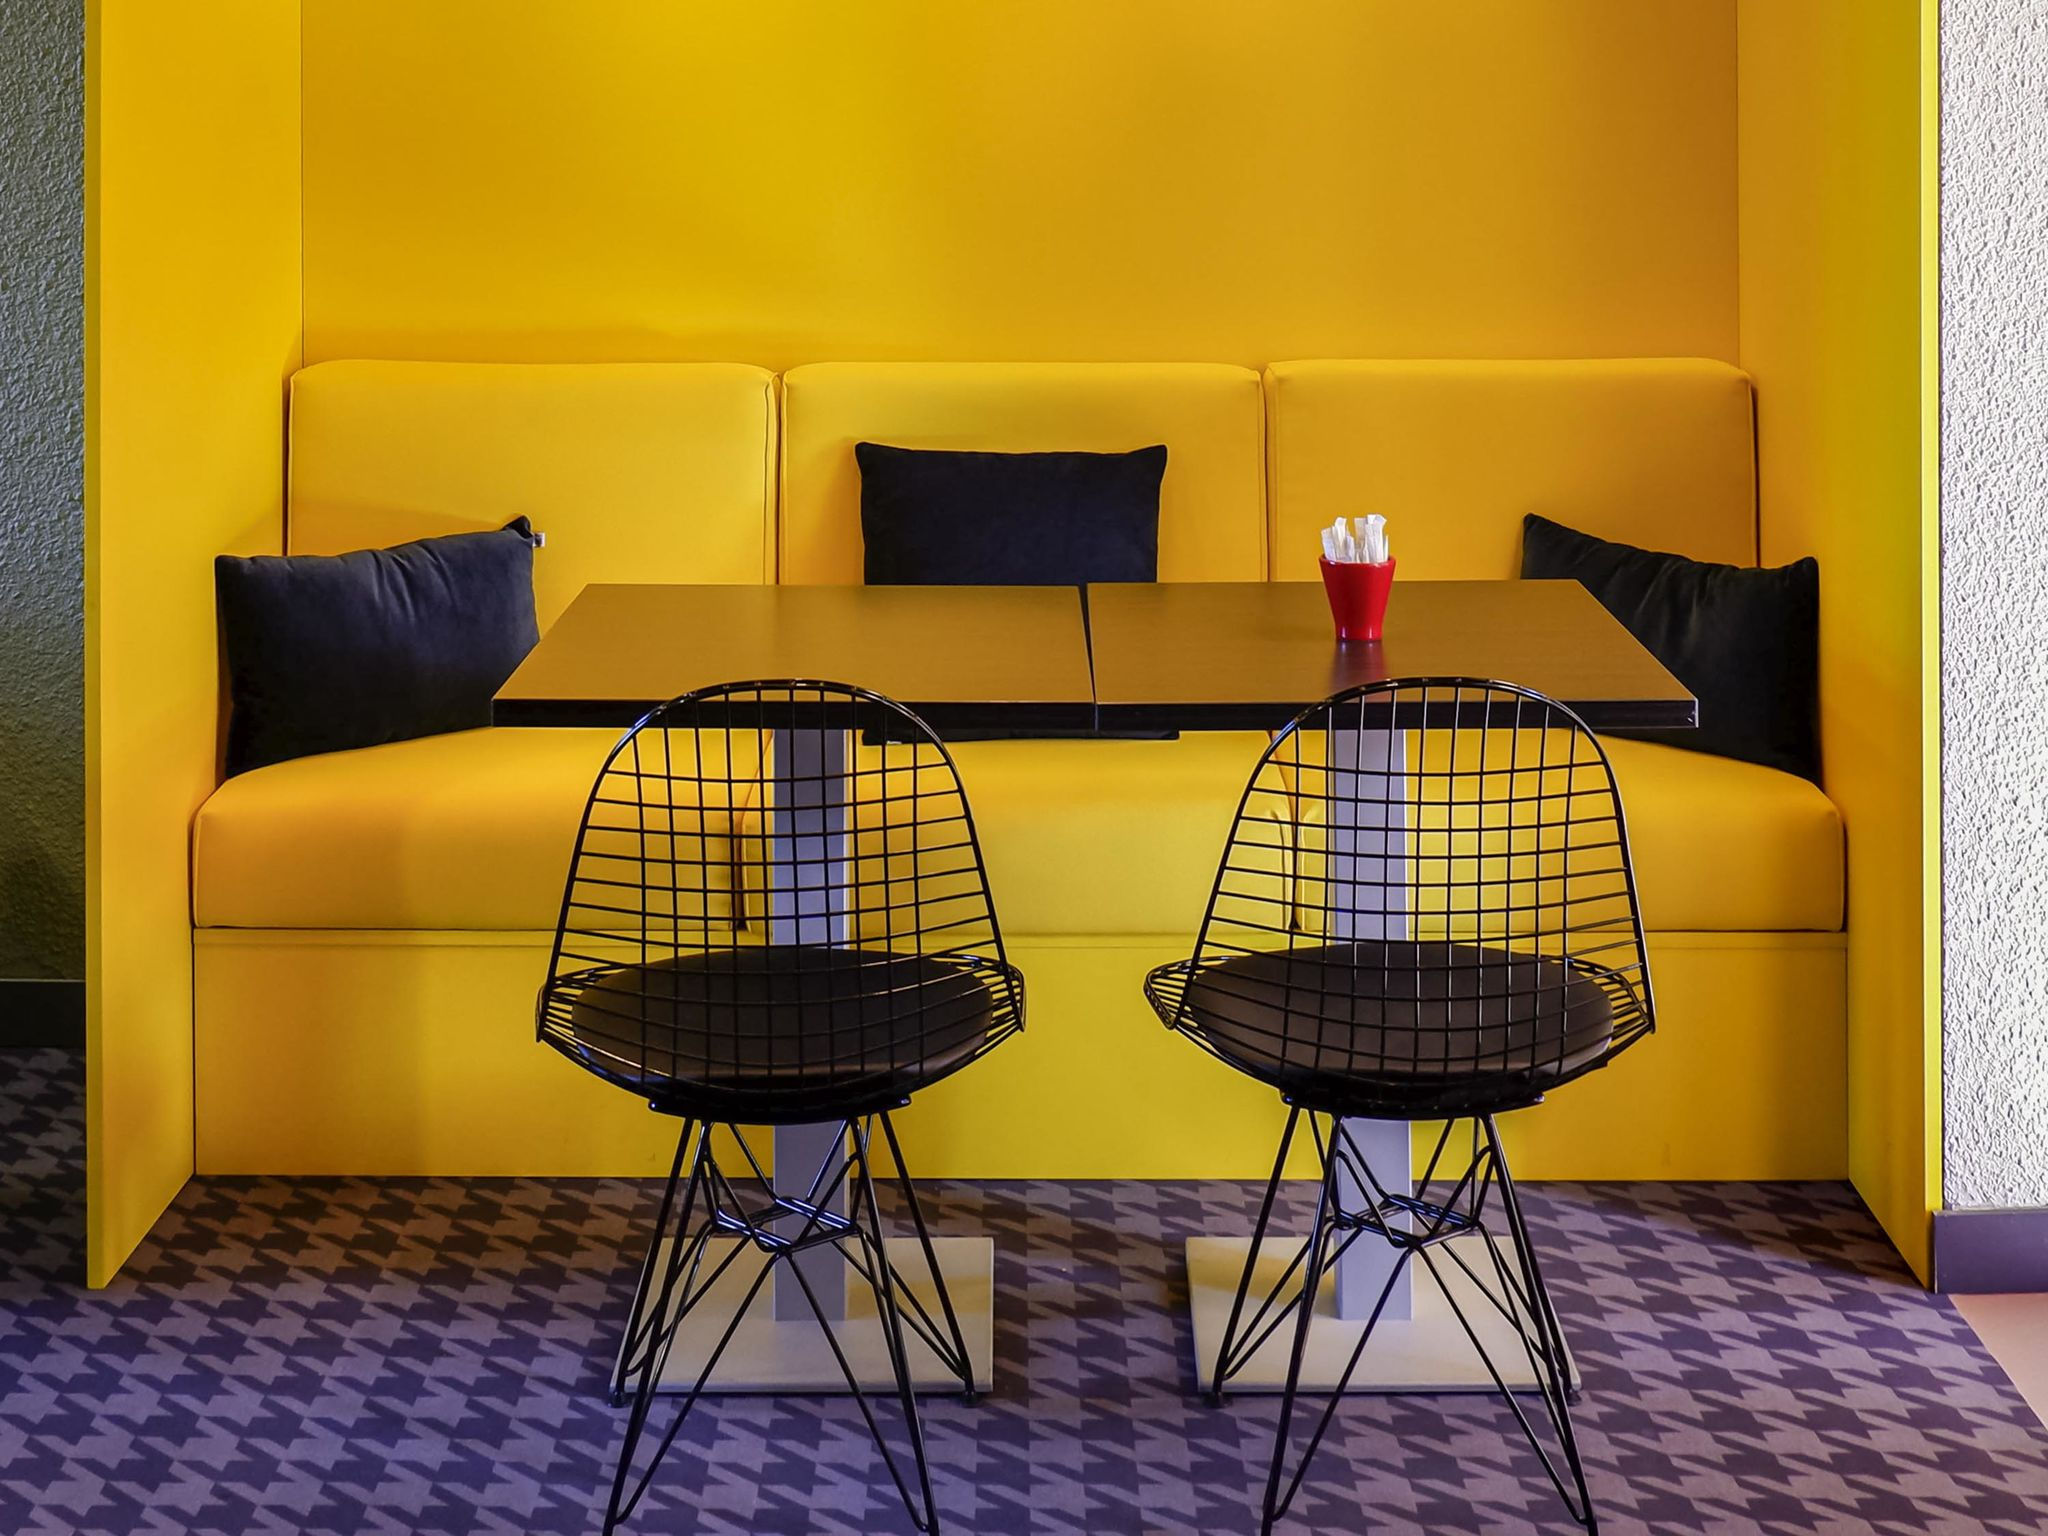 ... Breakfast - ibis Limoges Centre ... 9e22b1b84c22